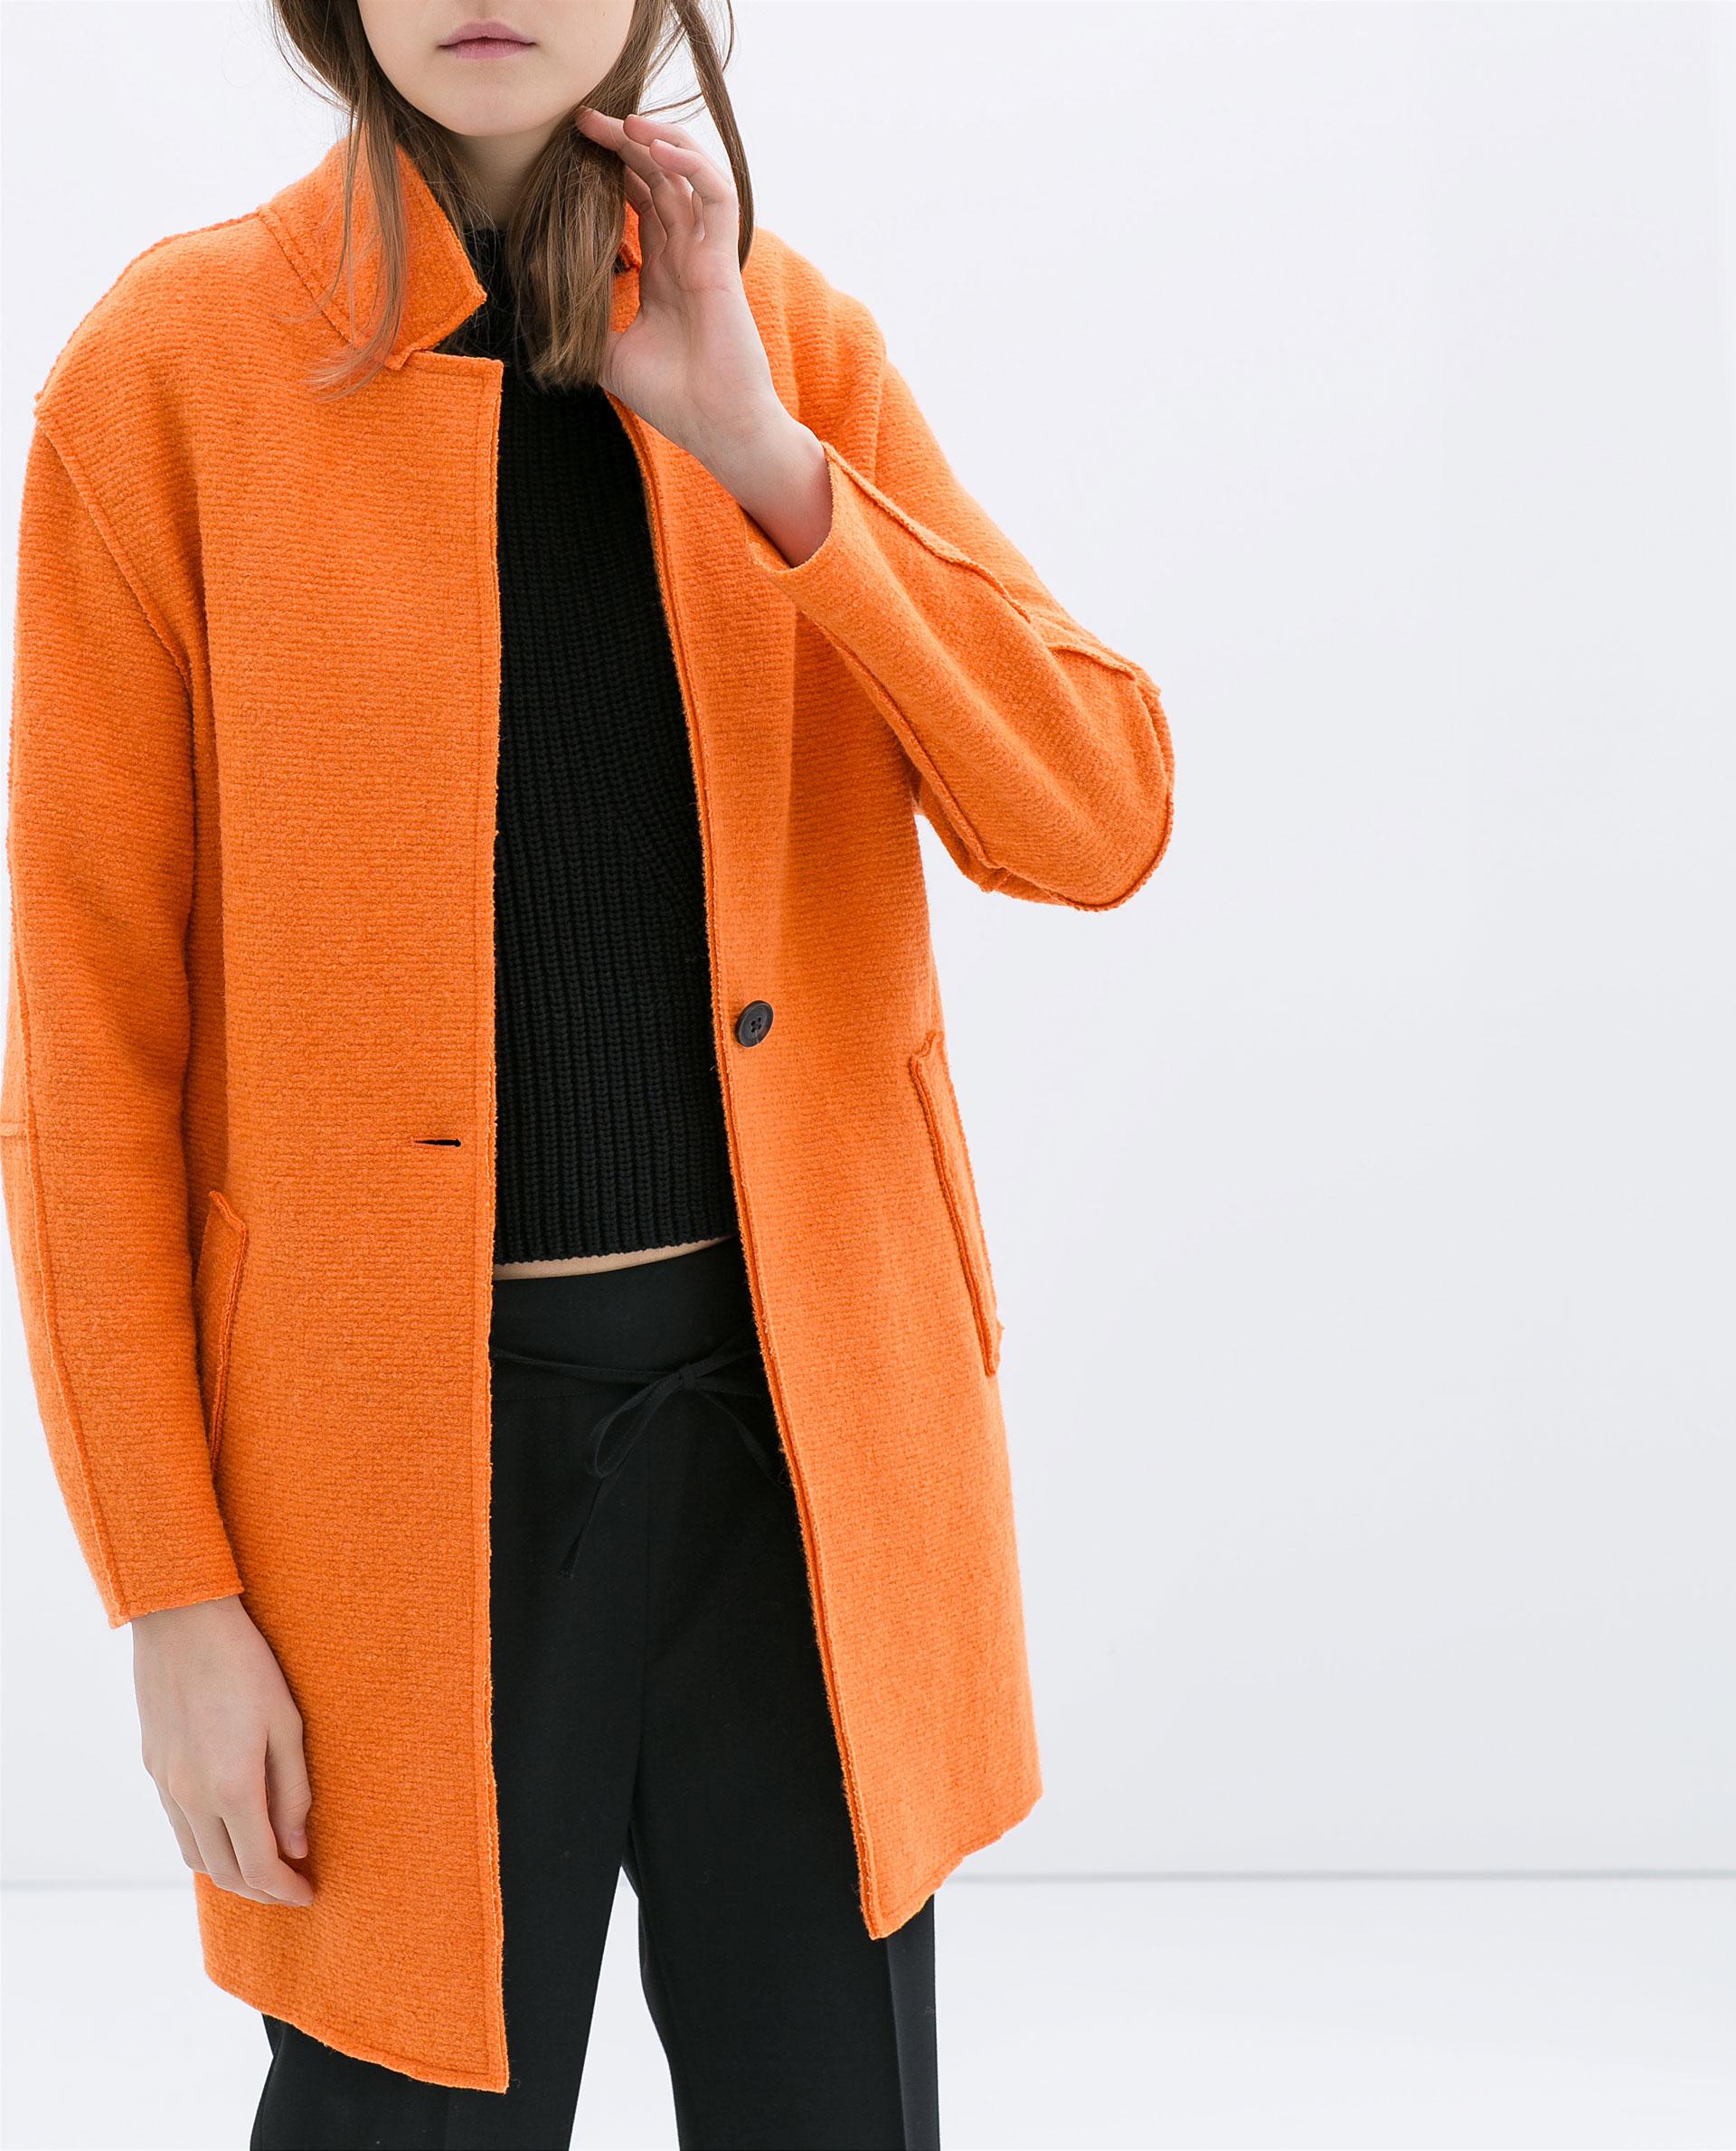 Zara Wool Coat in Orange | Lyst